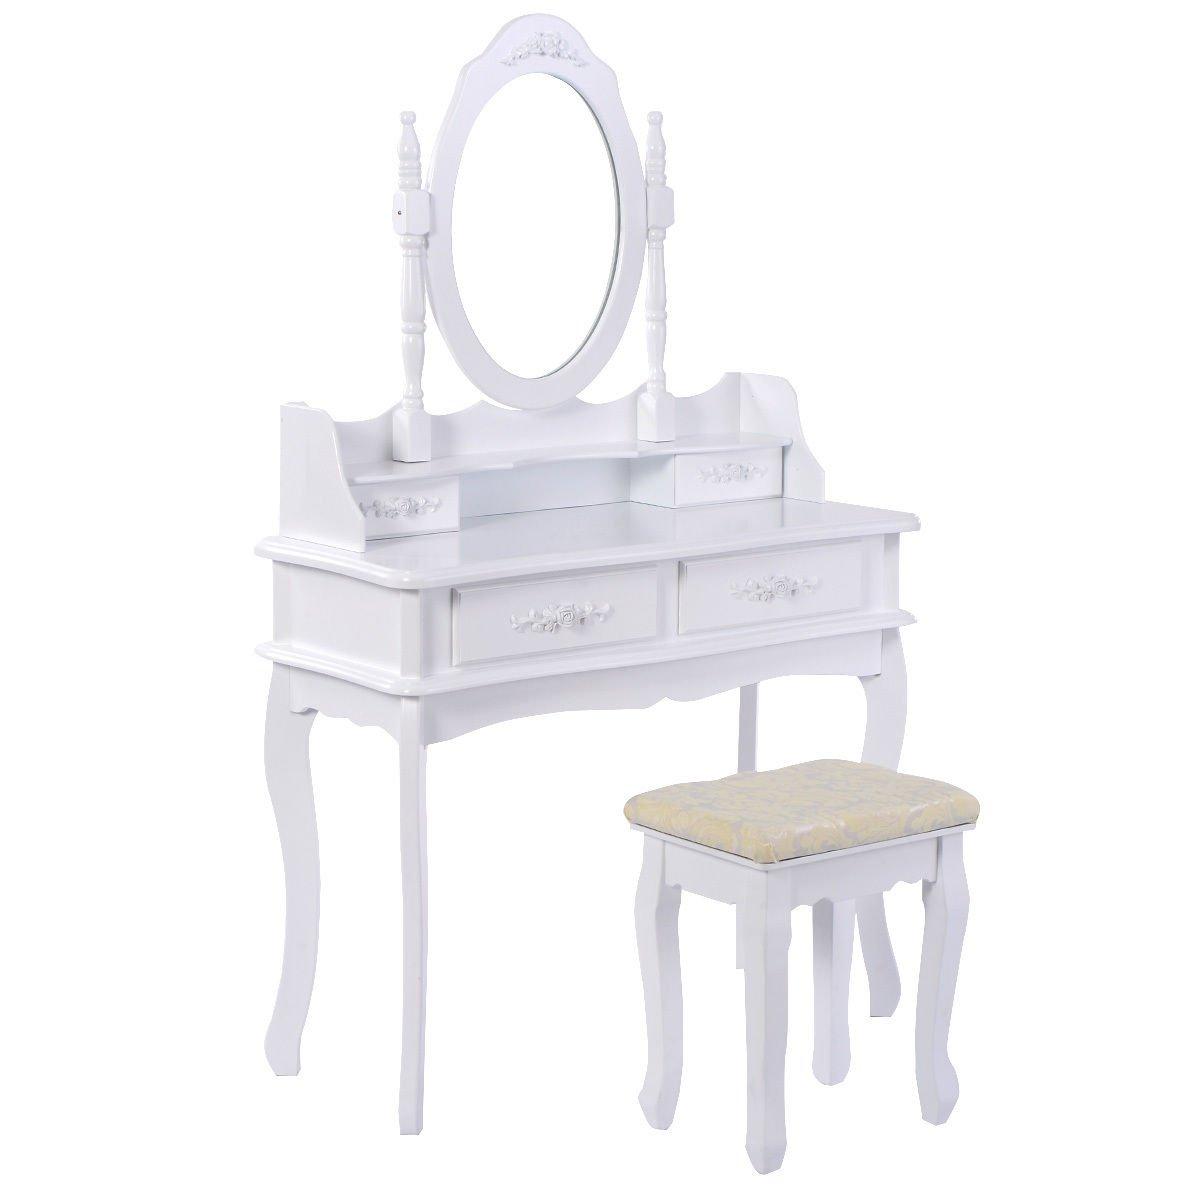 Amazon.com: Giantex White Bathroom Vanity Jewelry Makeup Dressing Table Set  W/Stool Mirror Wood Desk (4 Drawers): Kitchen U0026 Dining